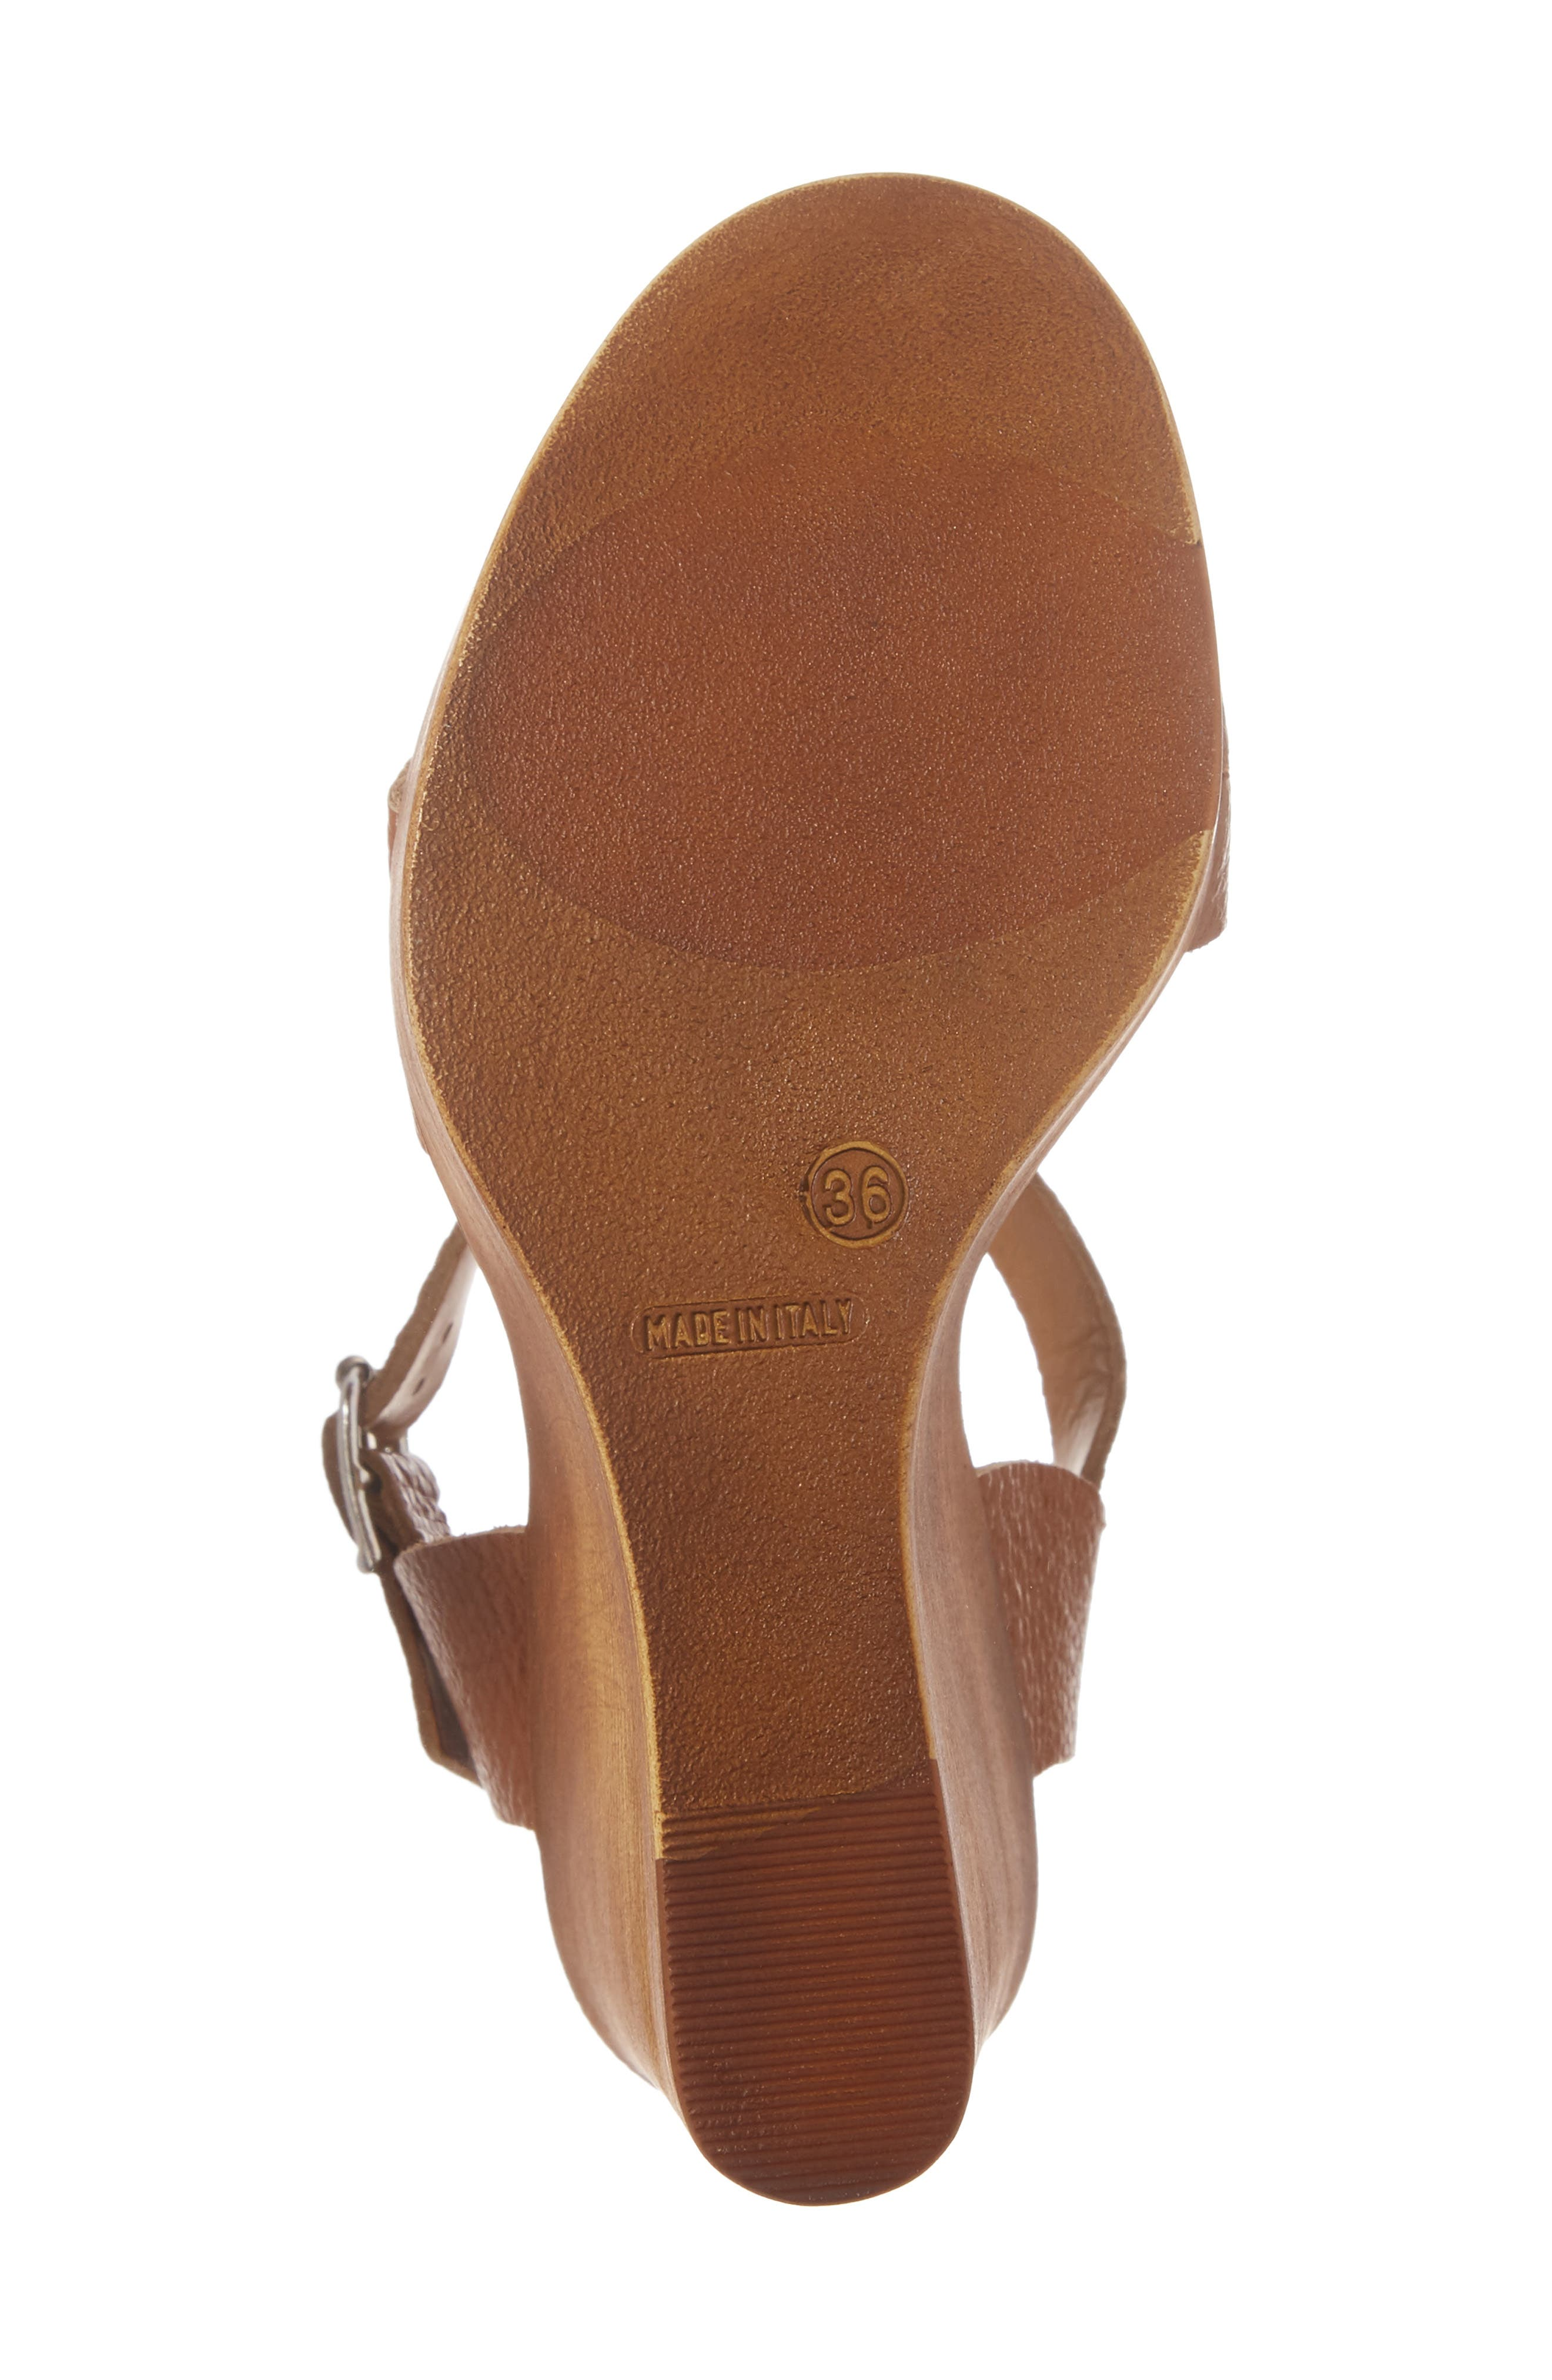 Belma Wedge Sandal,                             Alternate thumbnail 6, color,                             Tan Leather